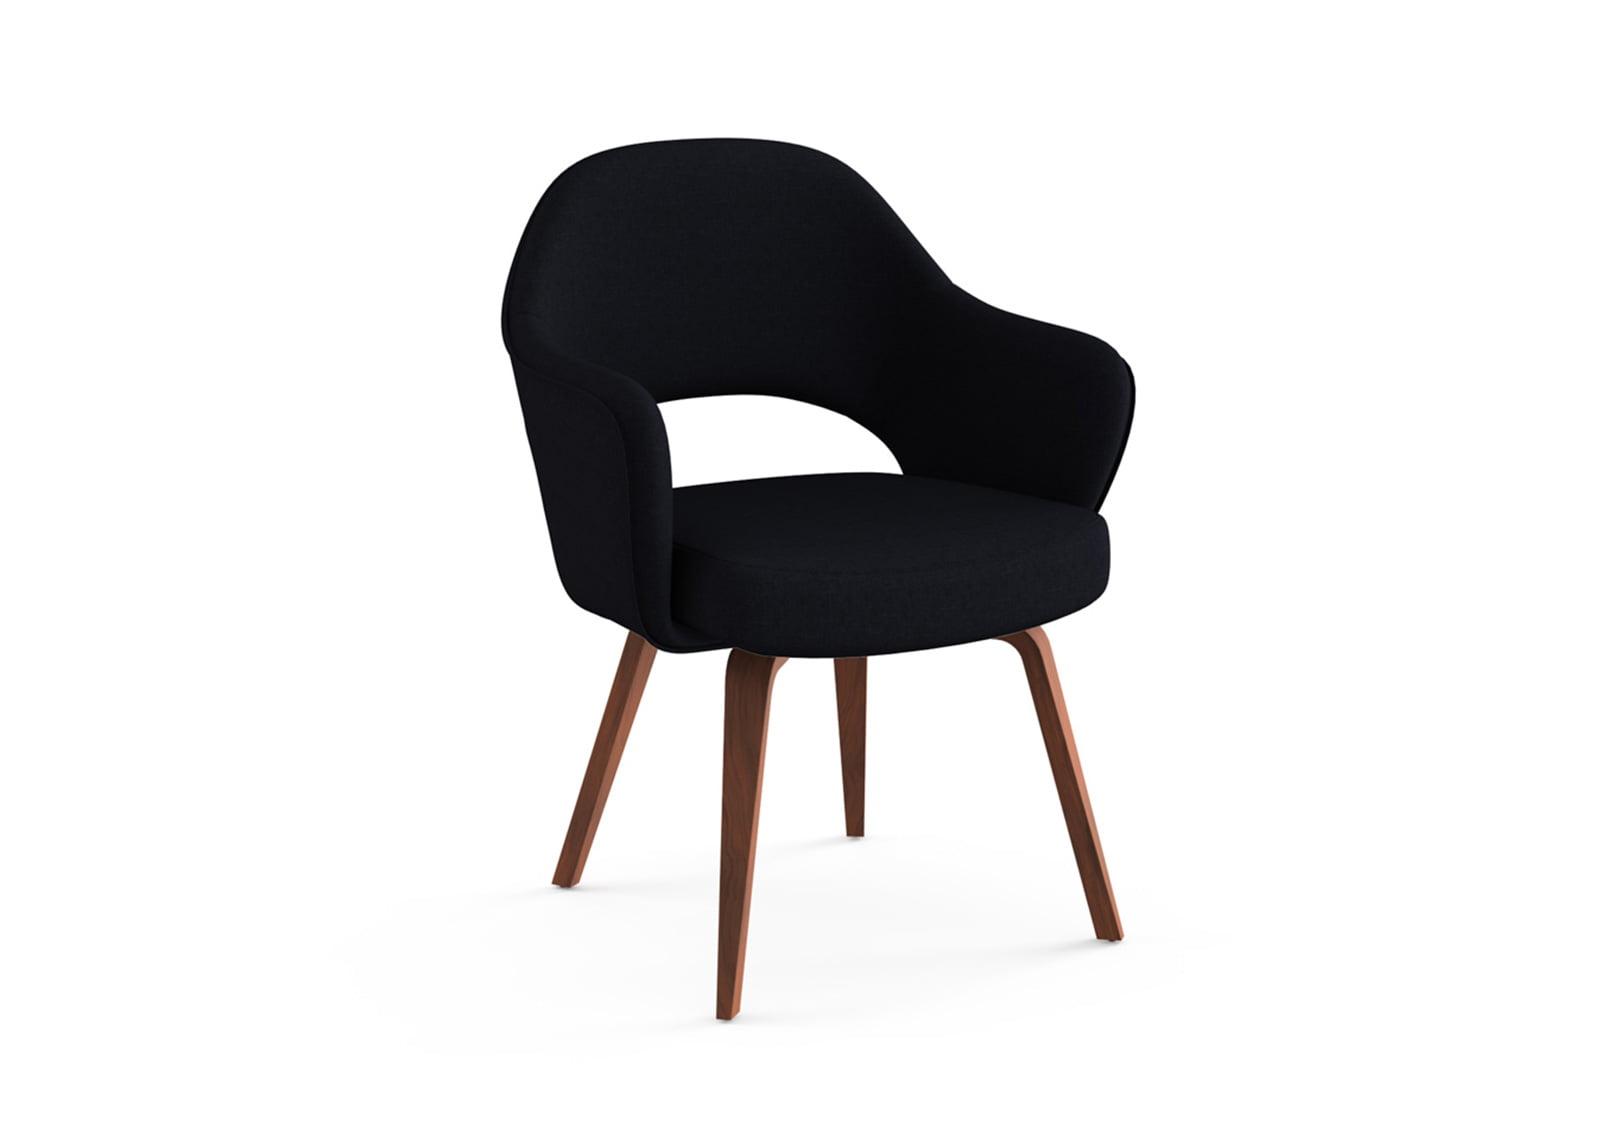 Superb Saarinen Executive Armchair (Wooden Legs)